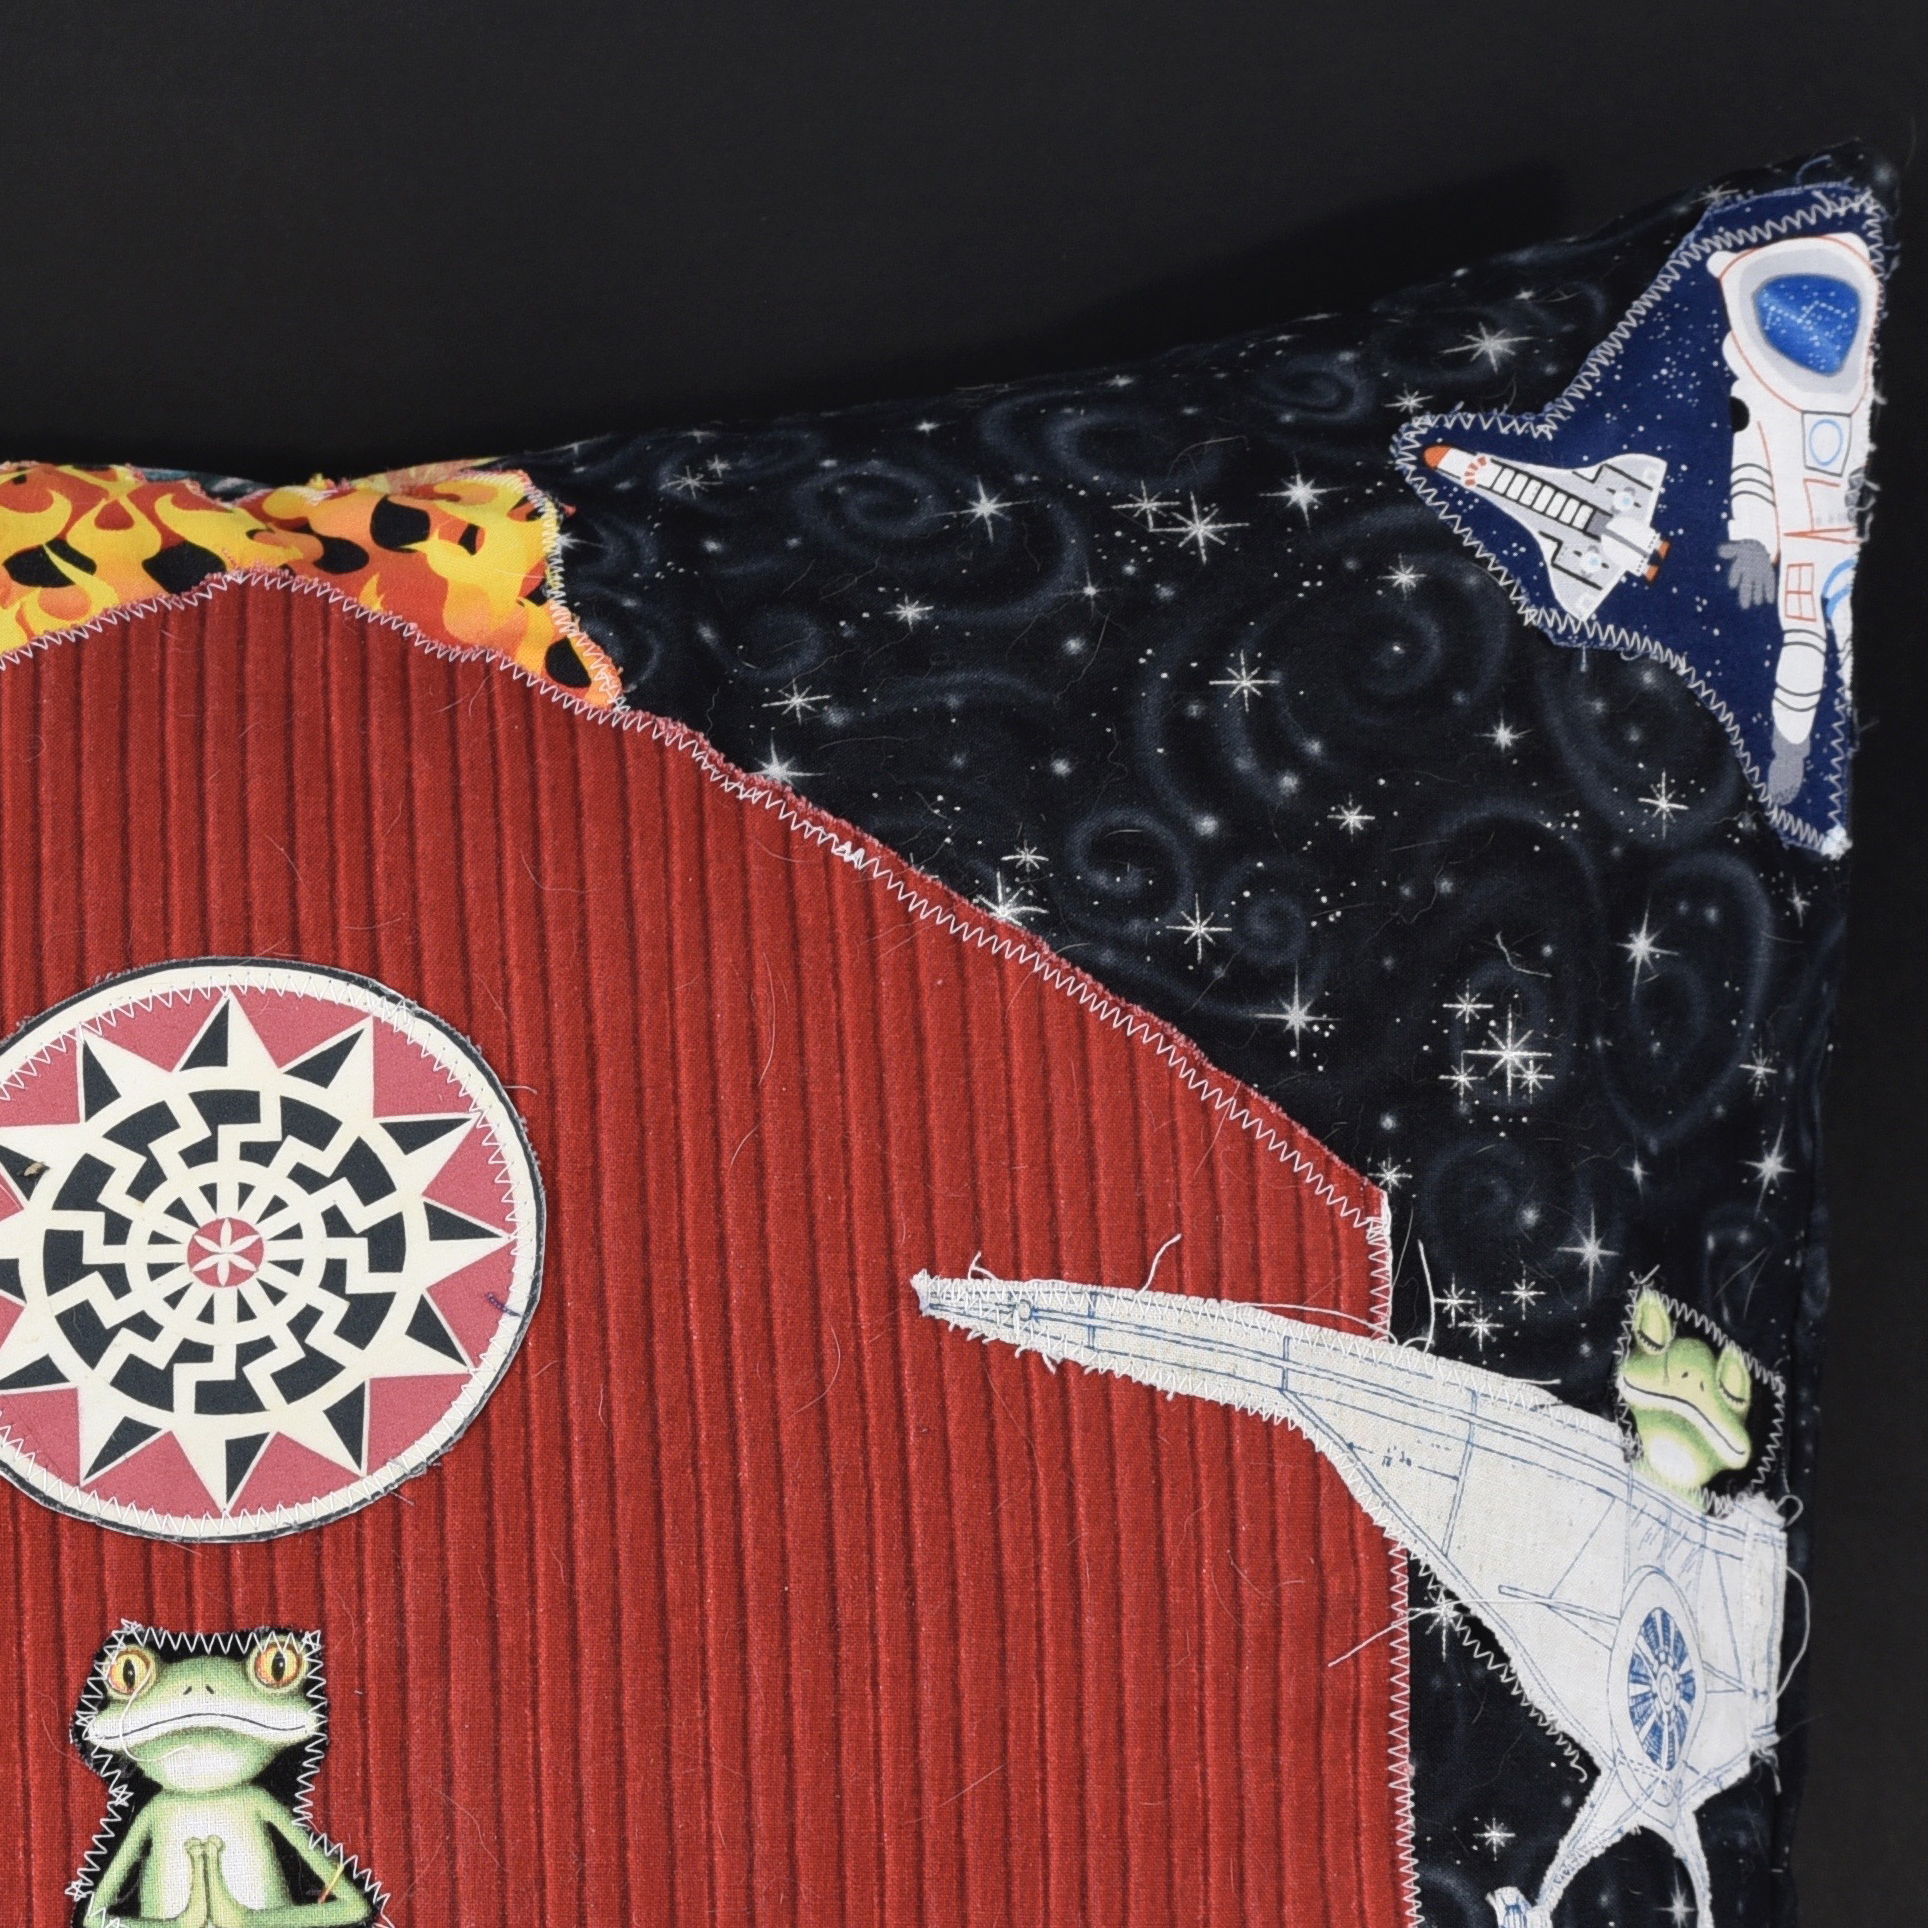 Janis-Kanter_pillows-04-detail2.jpg